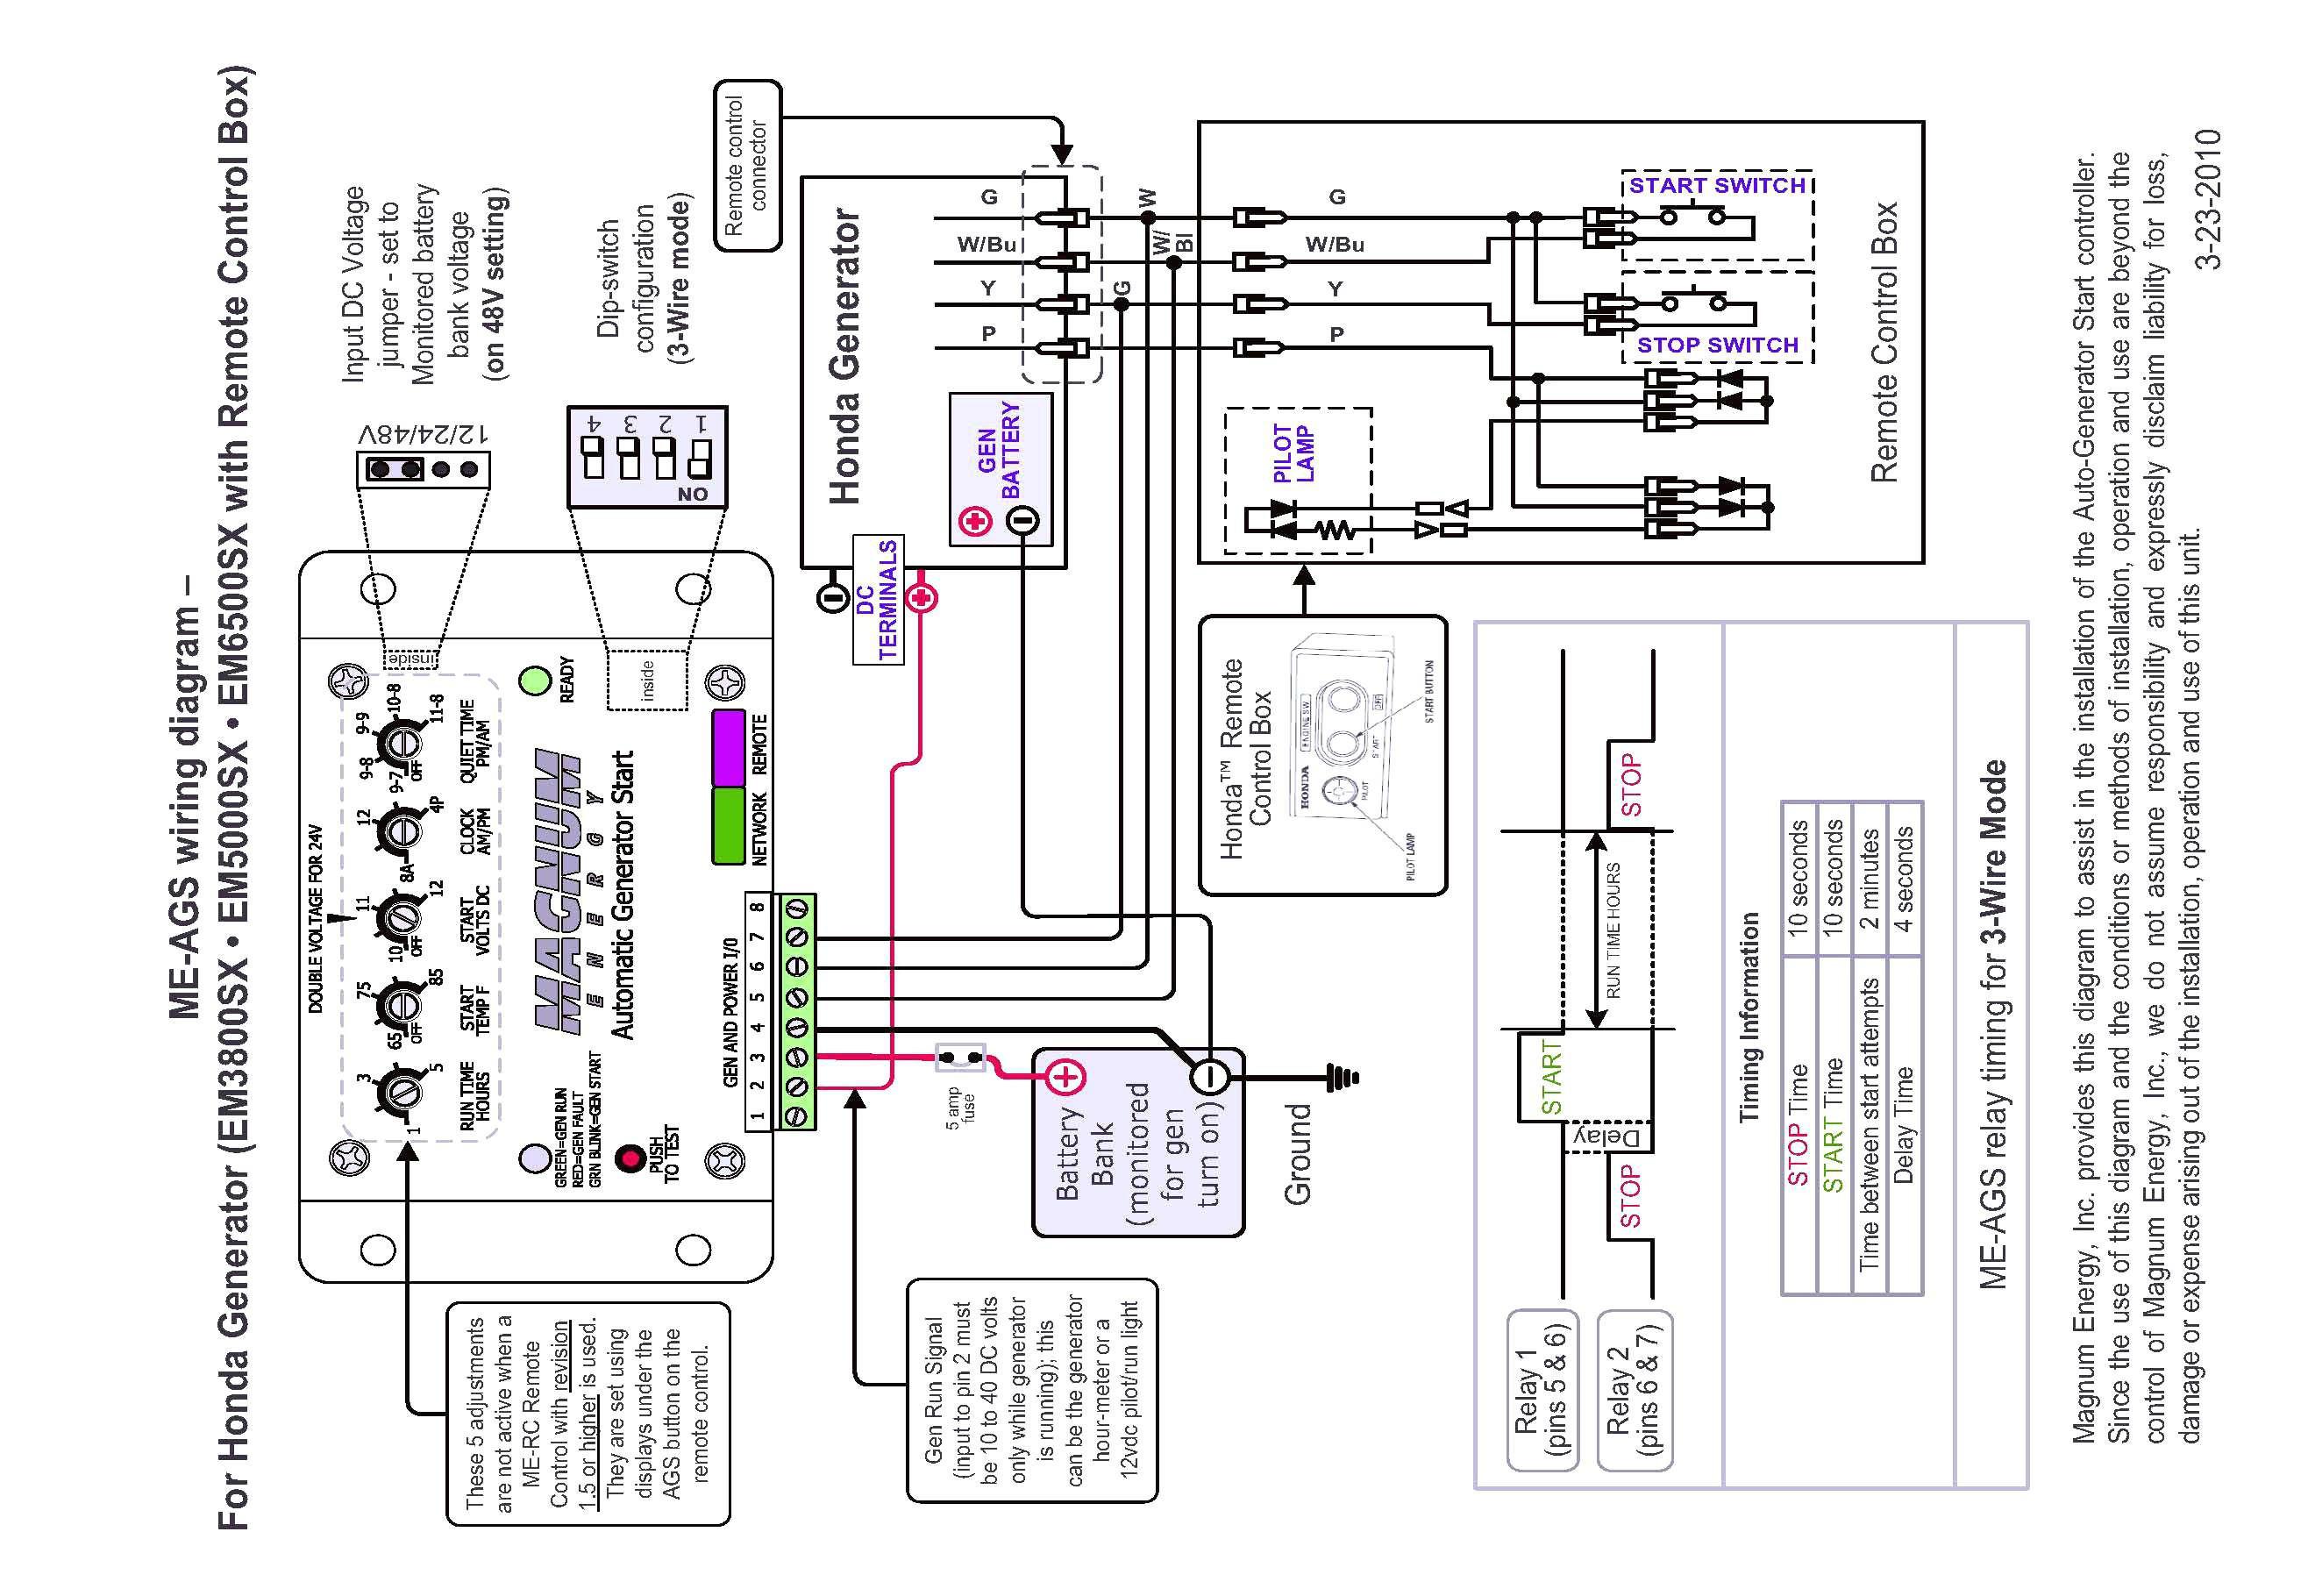 Generac Battery Charger Wiring Diagram Unique Wiring Diagram For - Generac Battery Charger Wiring Diagram